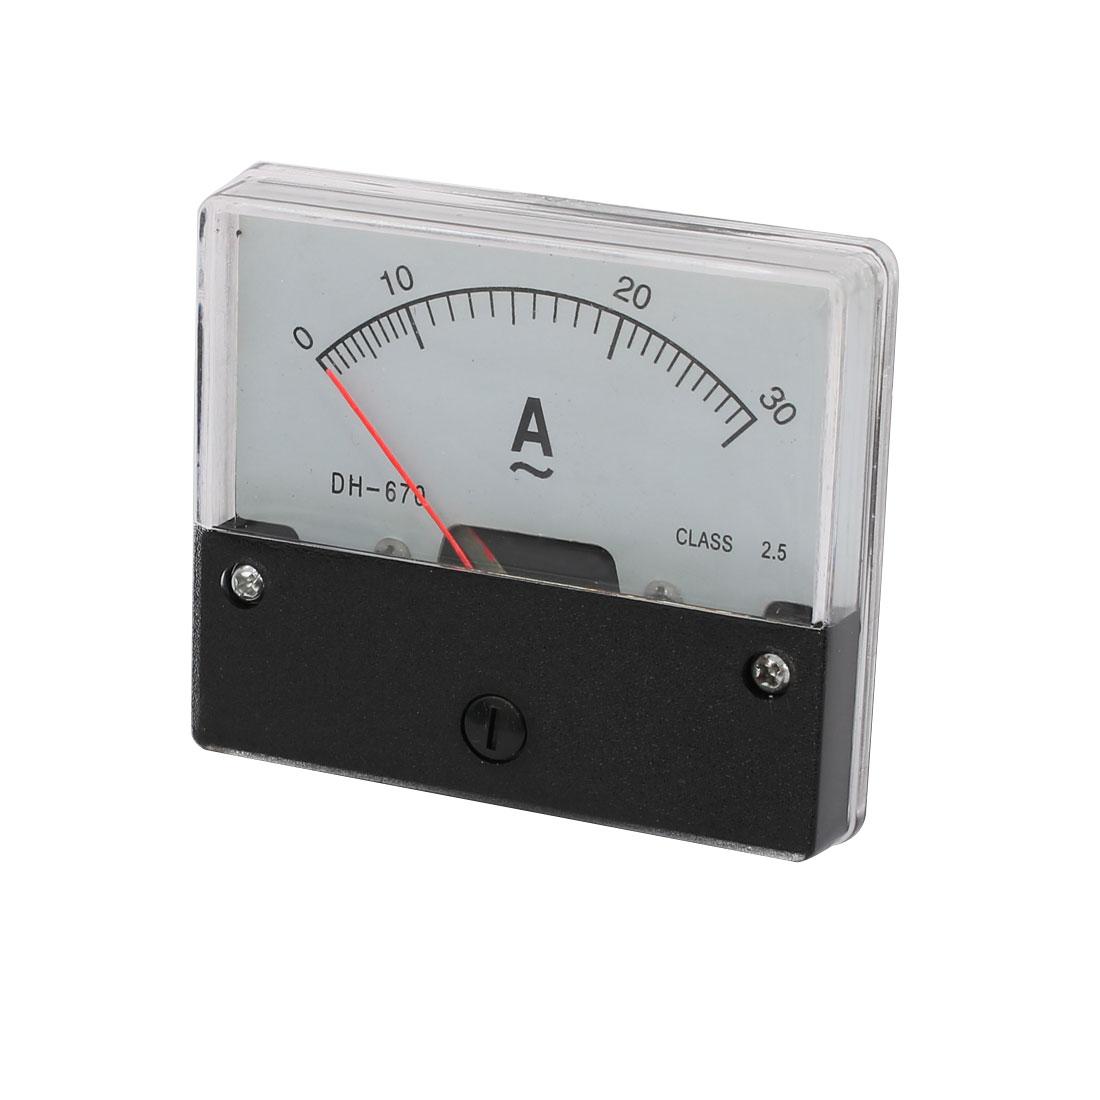 AC 0-30A Class 2.5 Analog Current Rectangle Panel Meter Ammeter Gauge